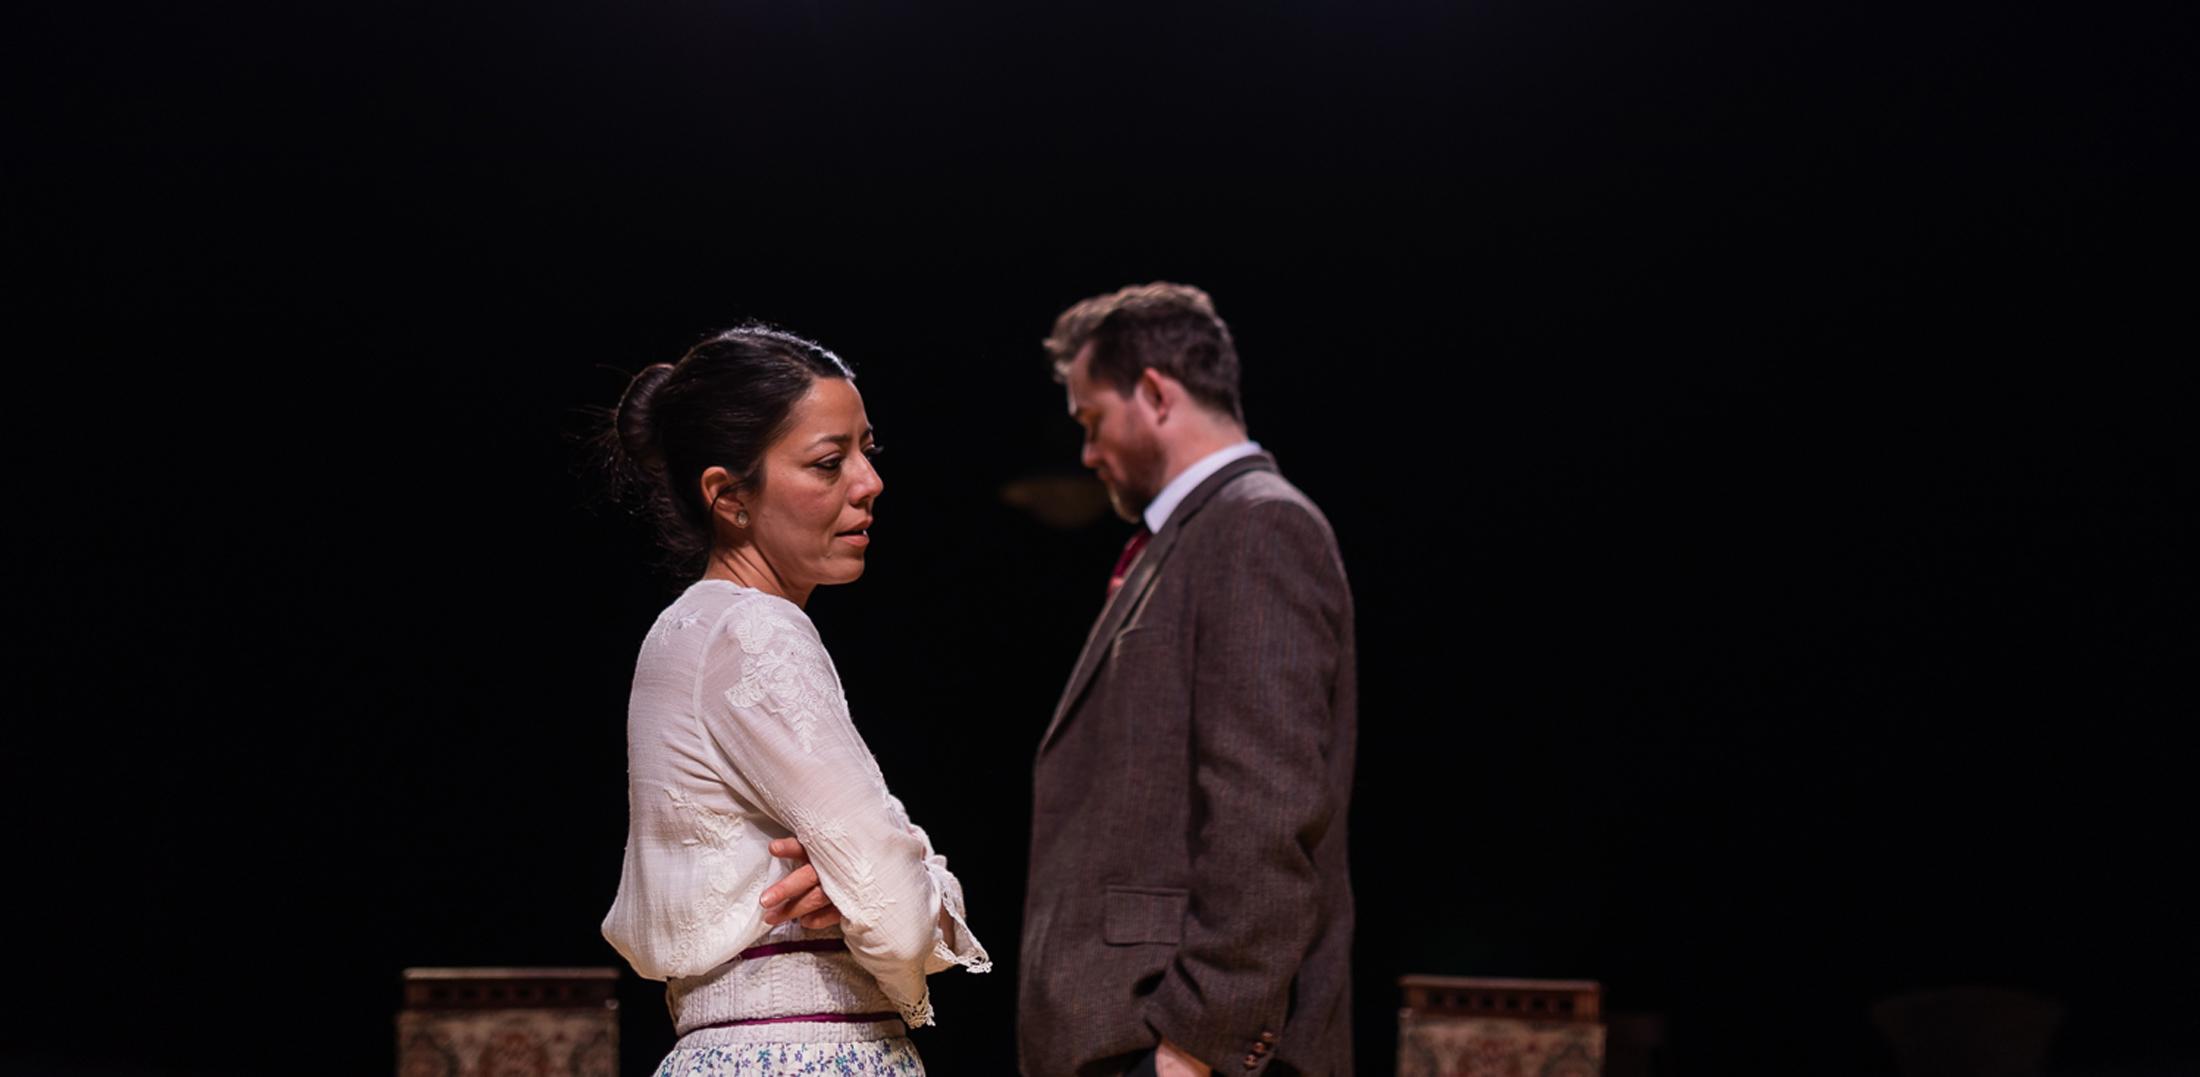 Vaishnavi Sharma as Eliza Doolittle and Eric Tucker as Henry Higgins on stage